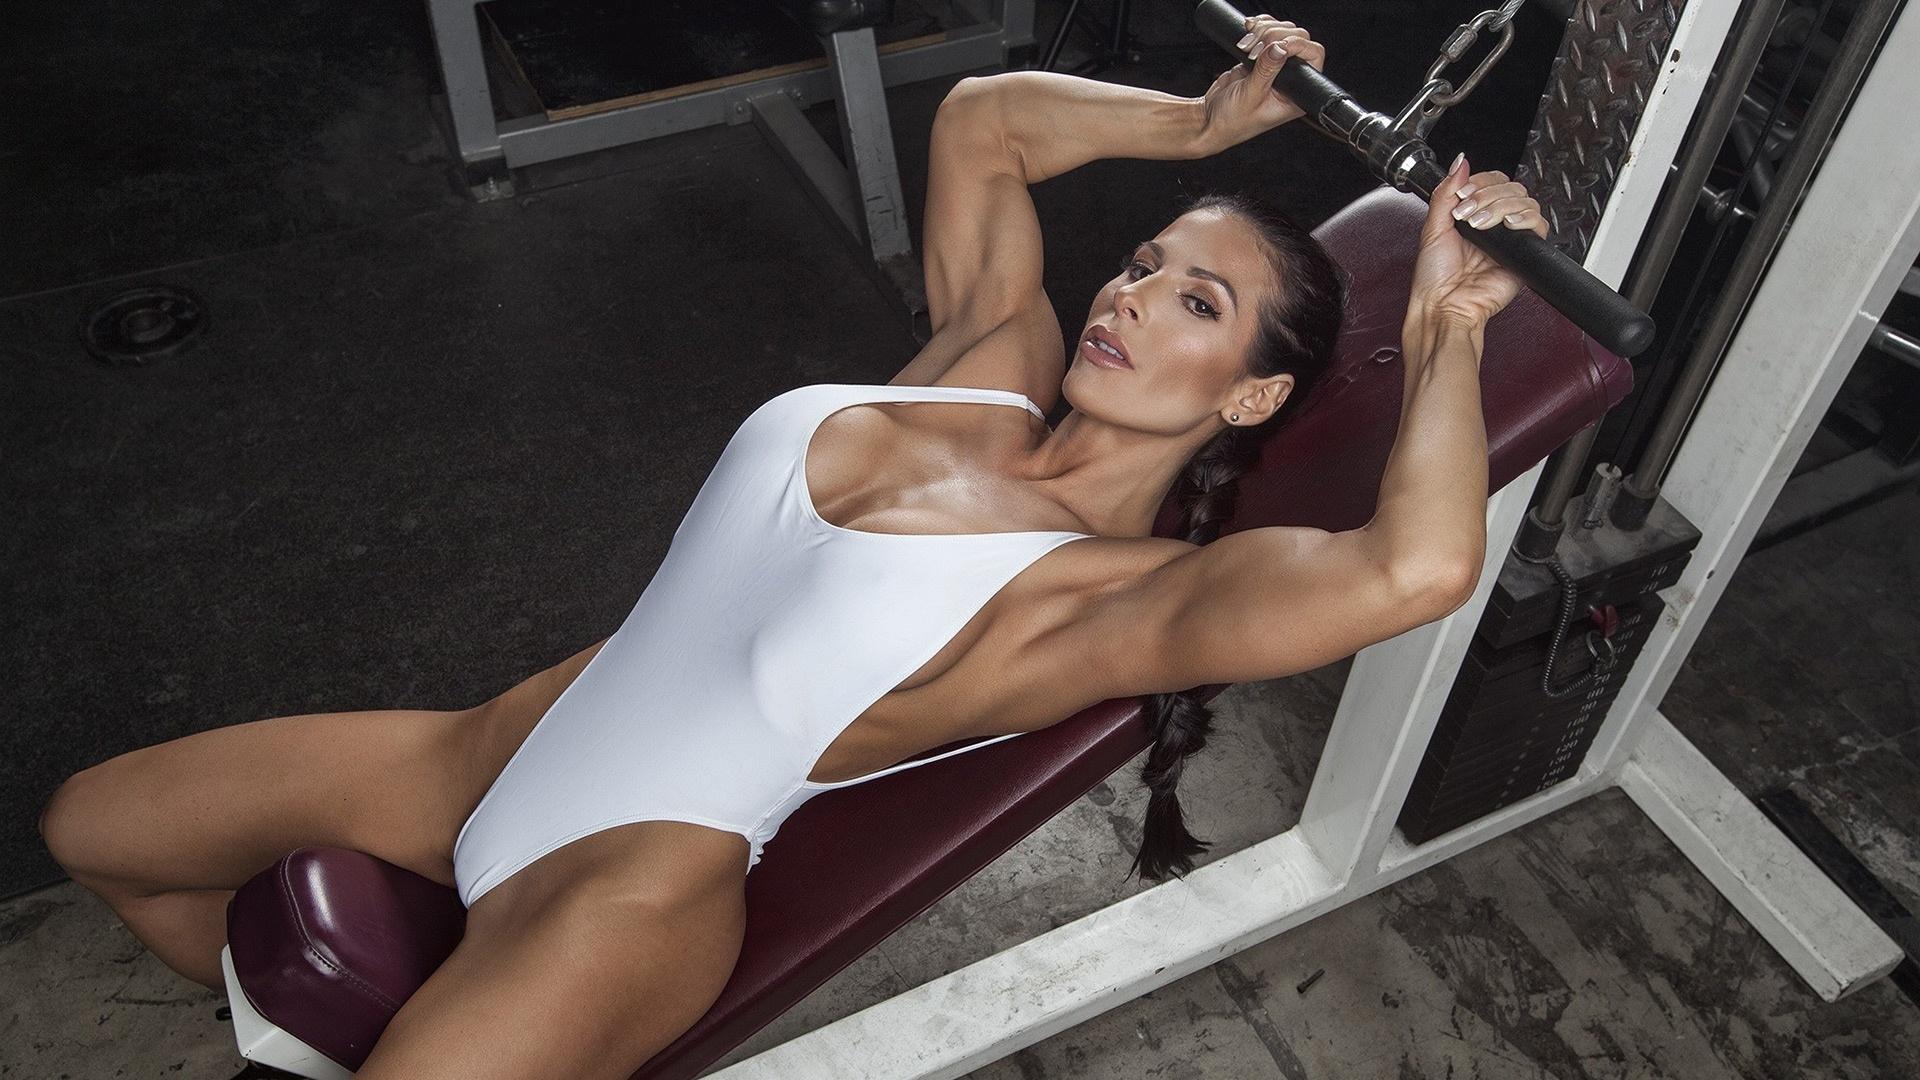 nude fitness modell pornostars